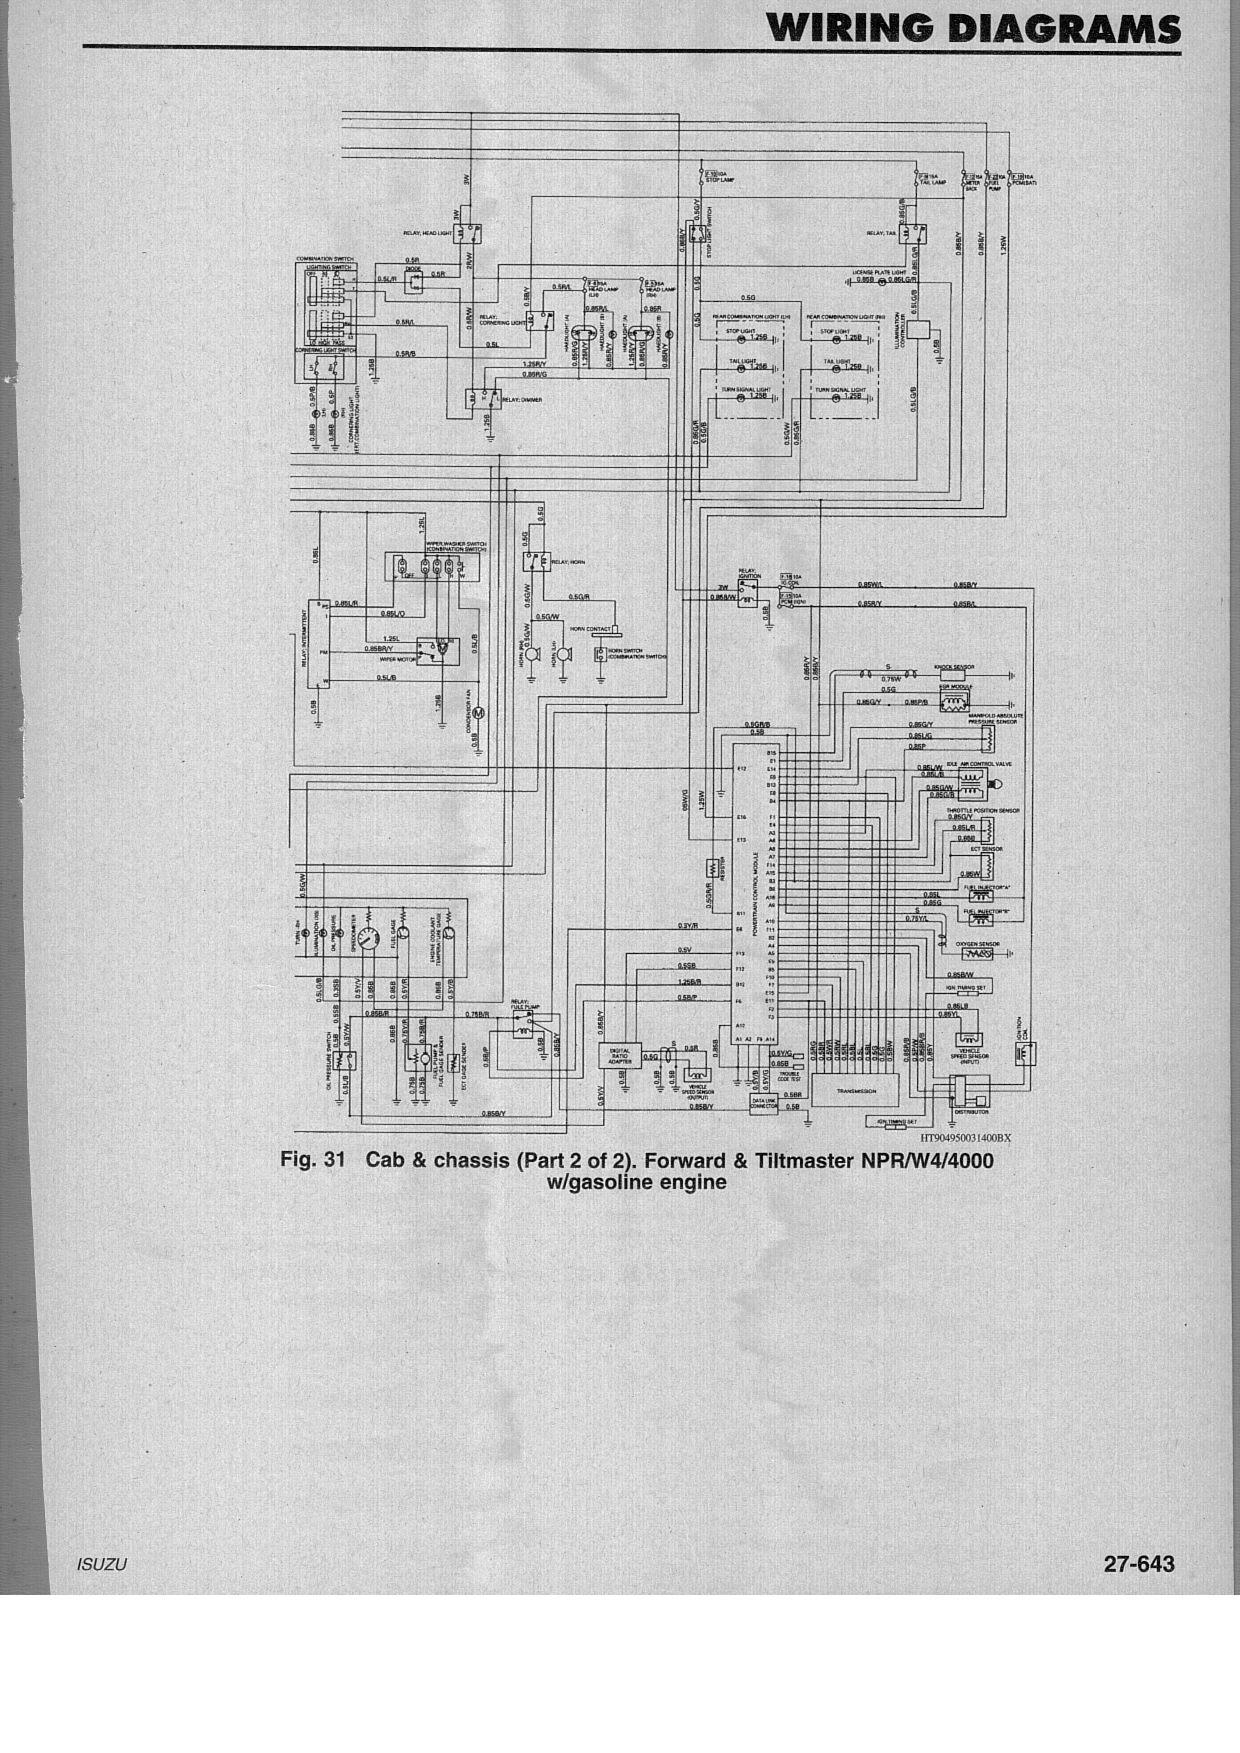 Isuzu W 4 Wiring - Wiring Diagrams IMG trust - trust.farmaciastorelli.it